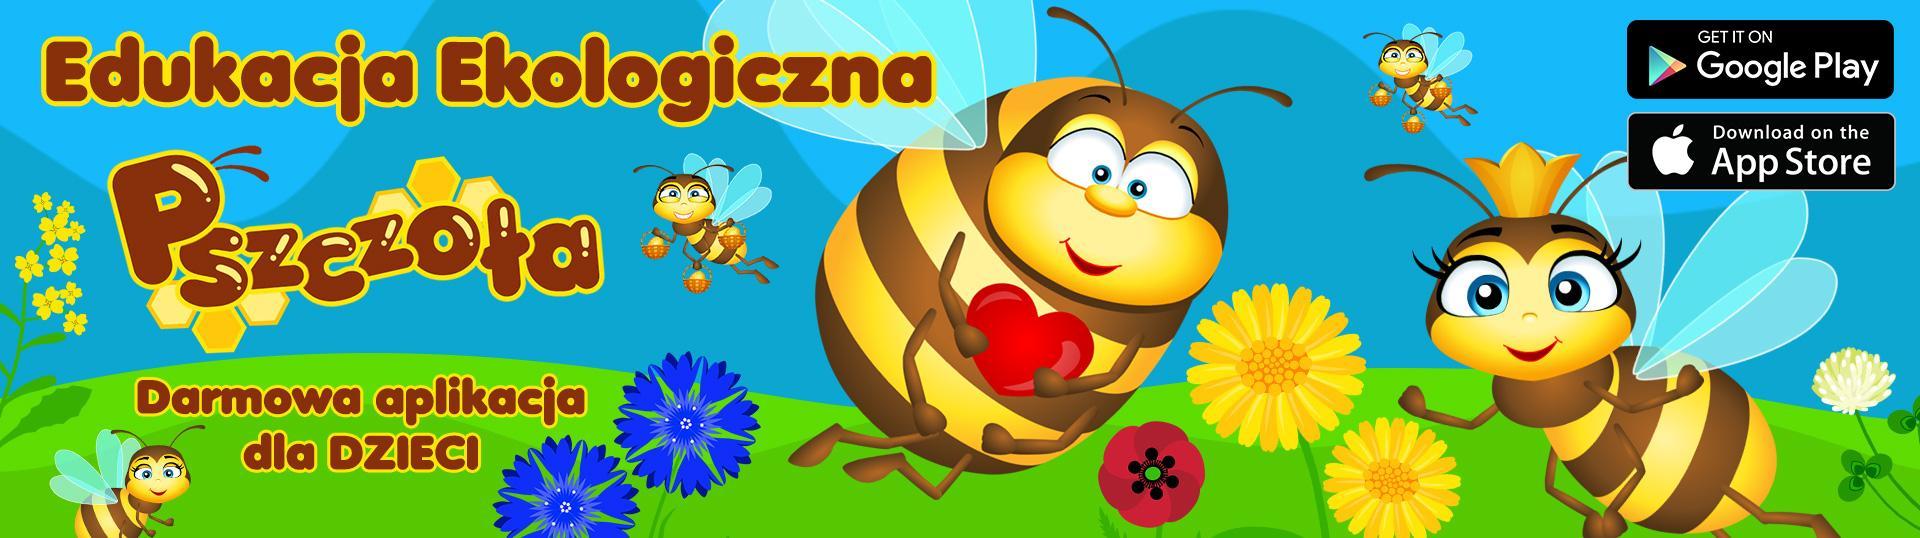 pszczola_1162x327_2